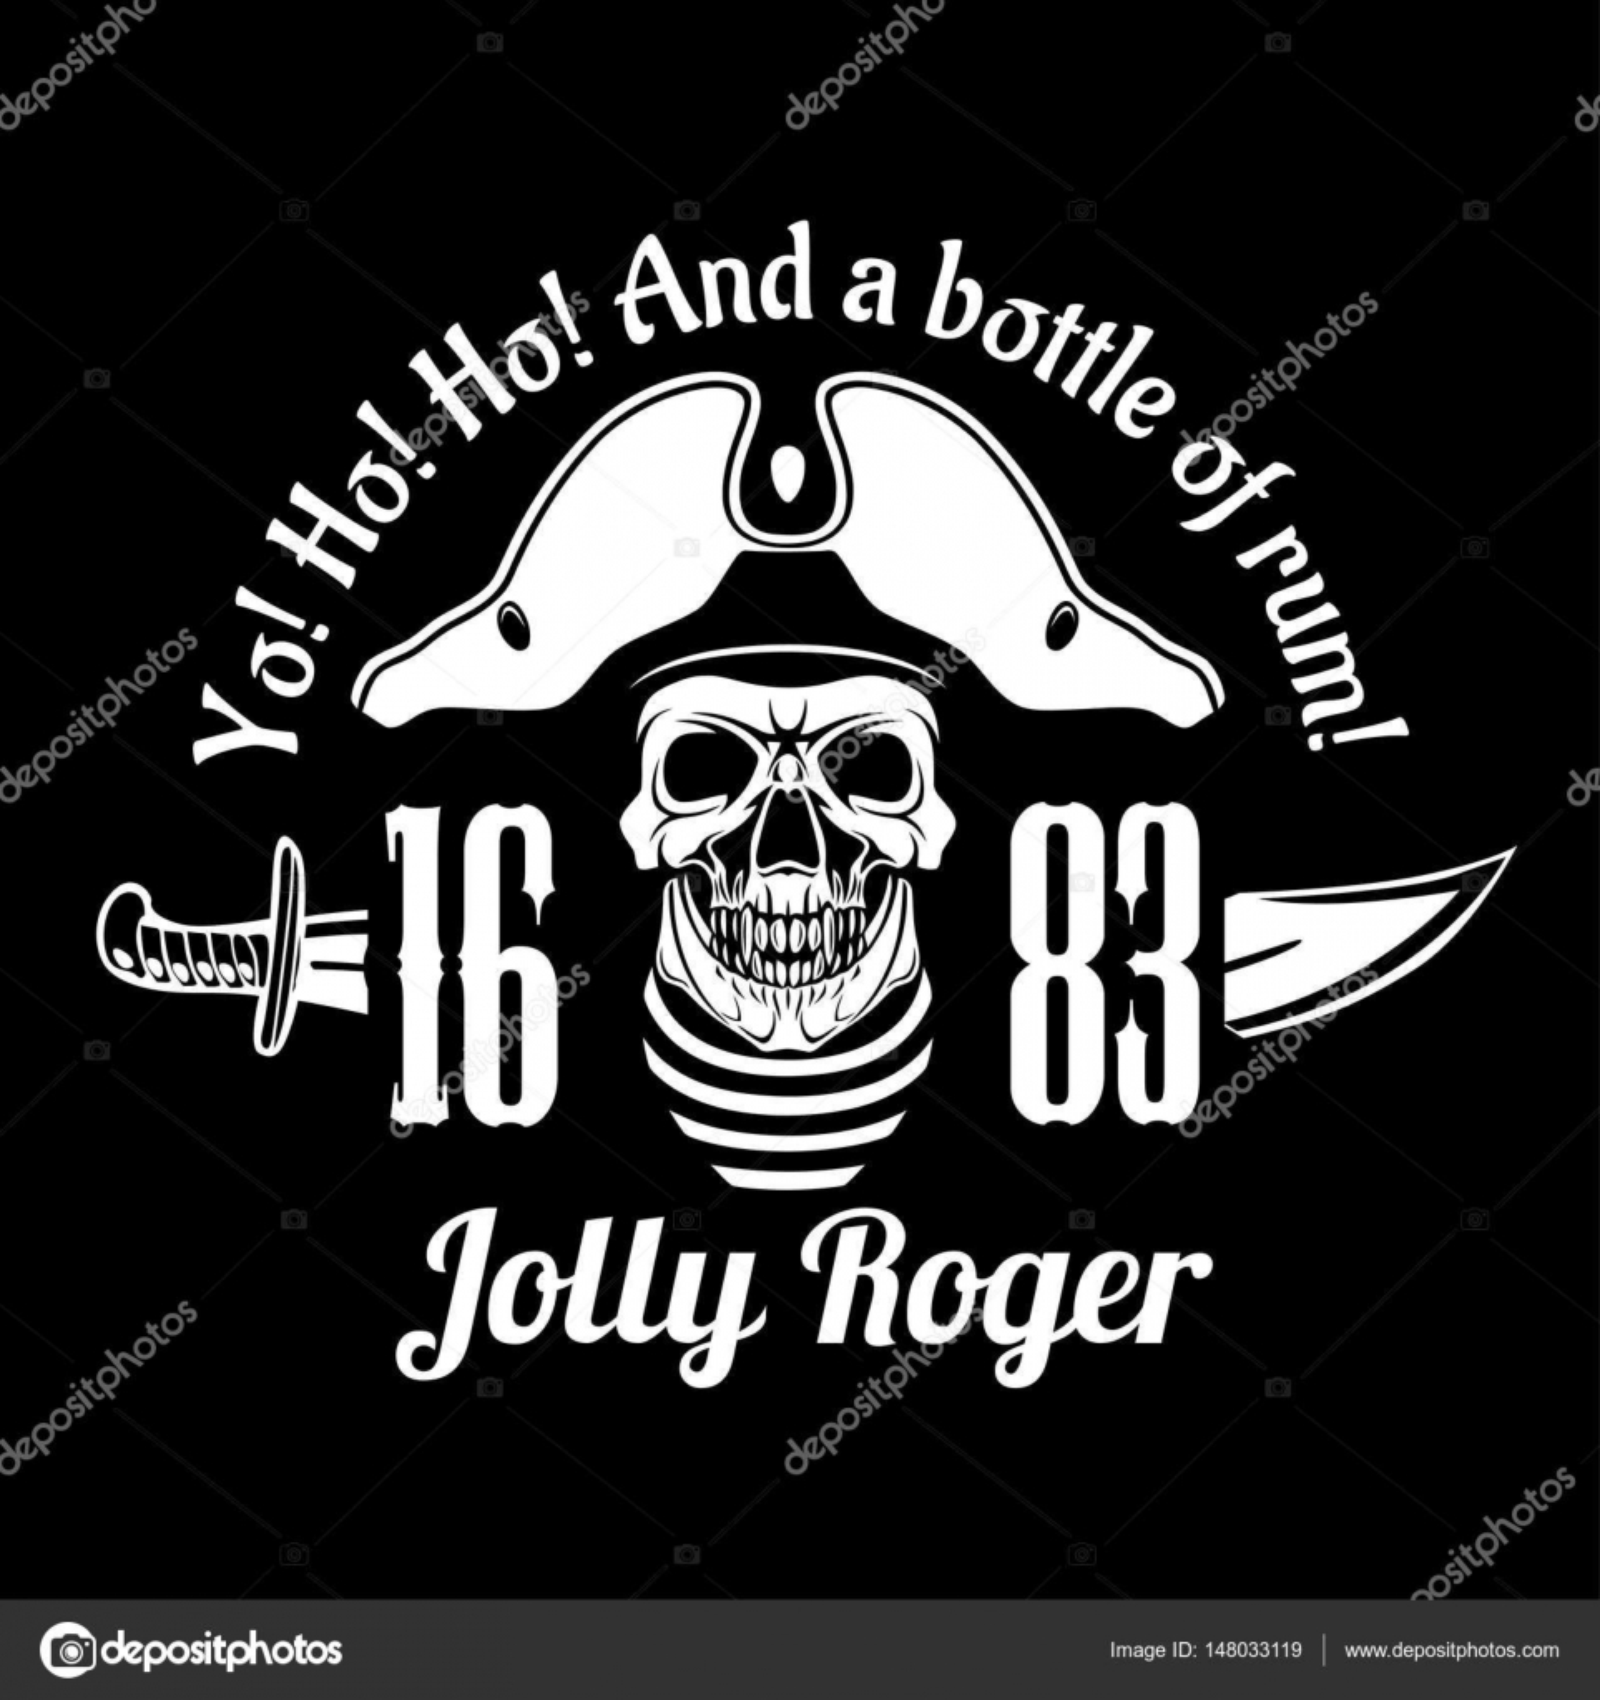 Símbolo de piratas Jolly Roger. Cartel de vector de calavera con ...